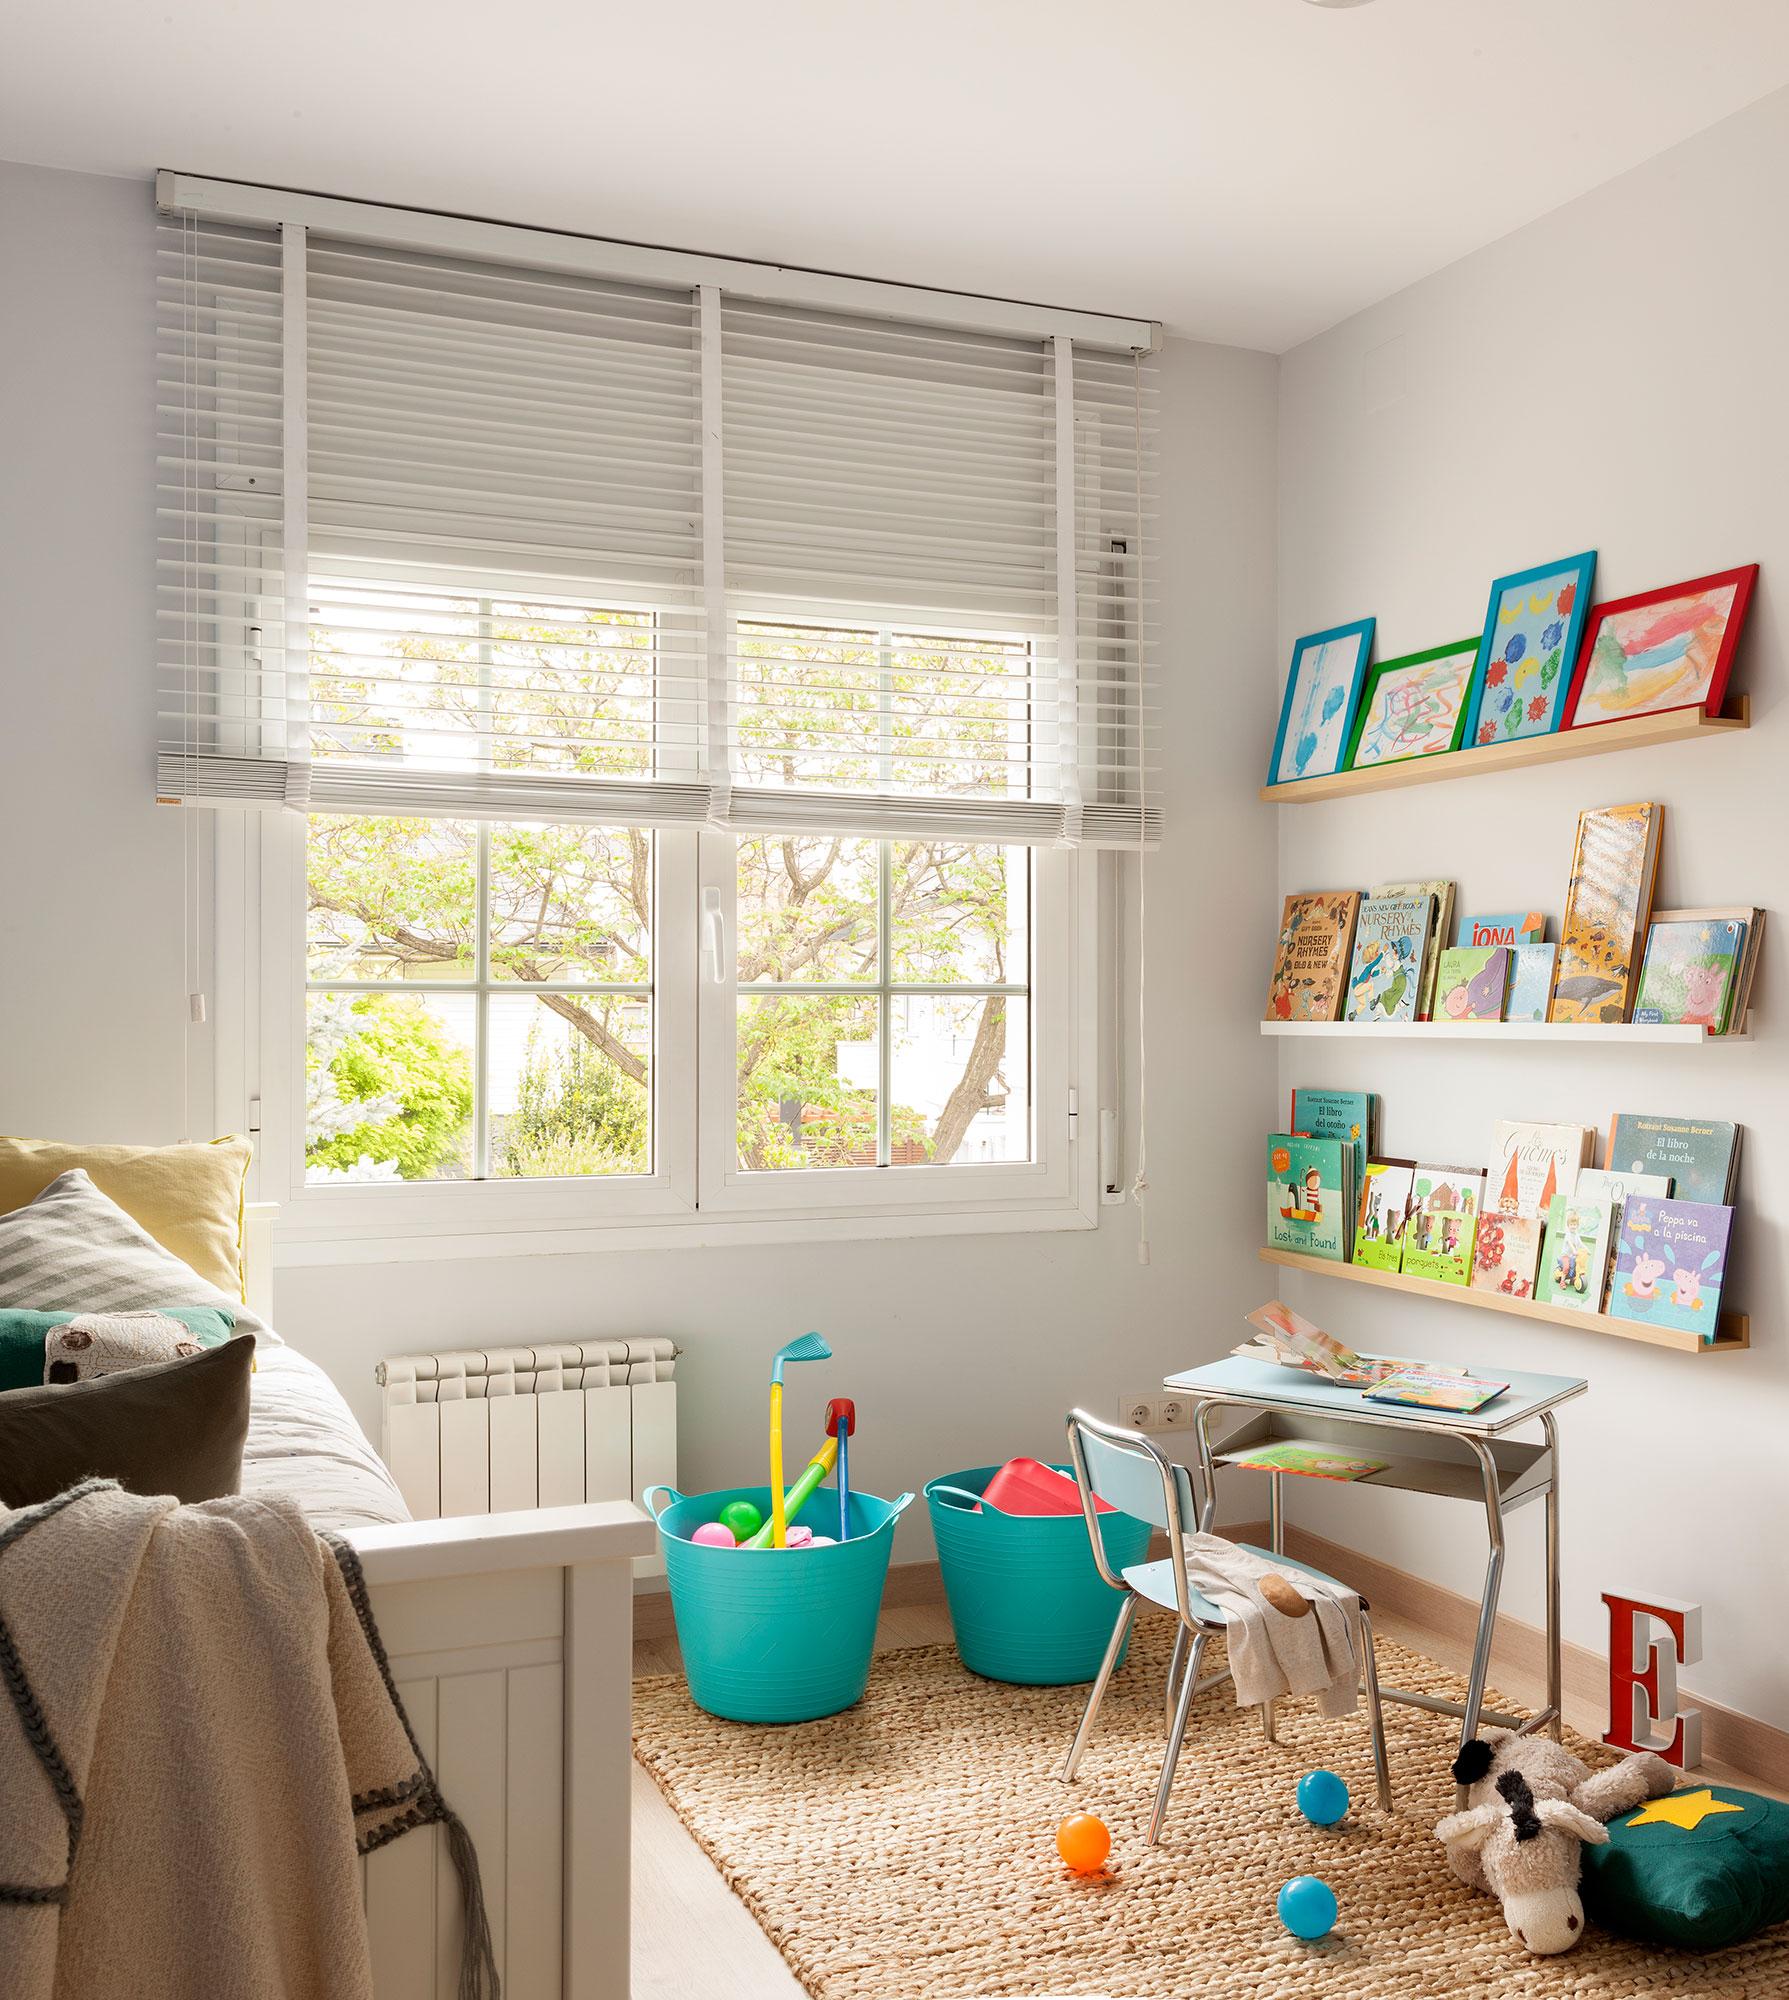 Estanterias para dormitorios infantiles good habitacin - Estanterias para dormitorios ...